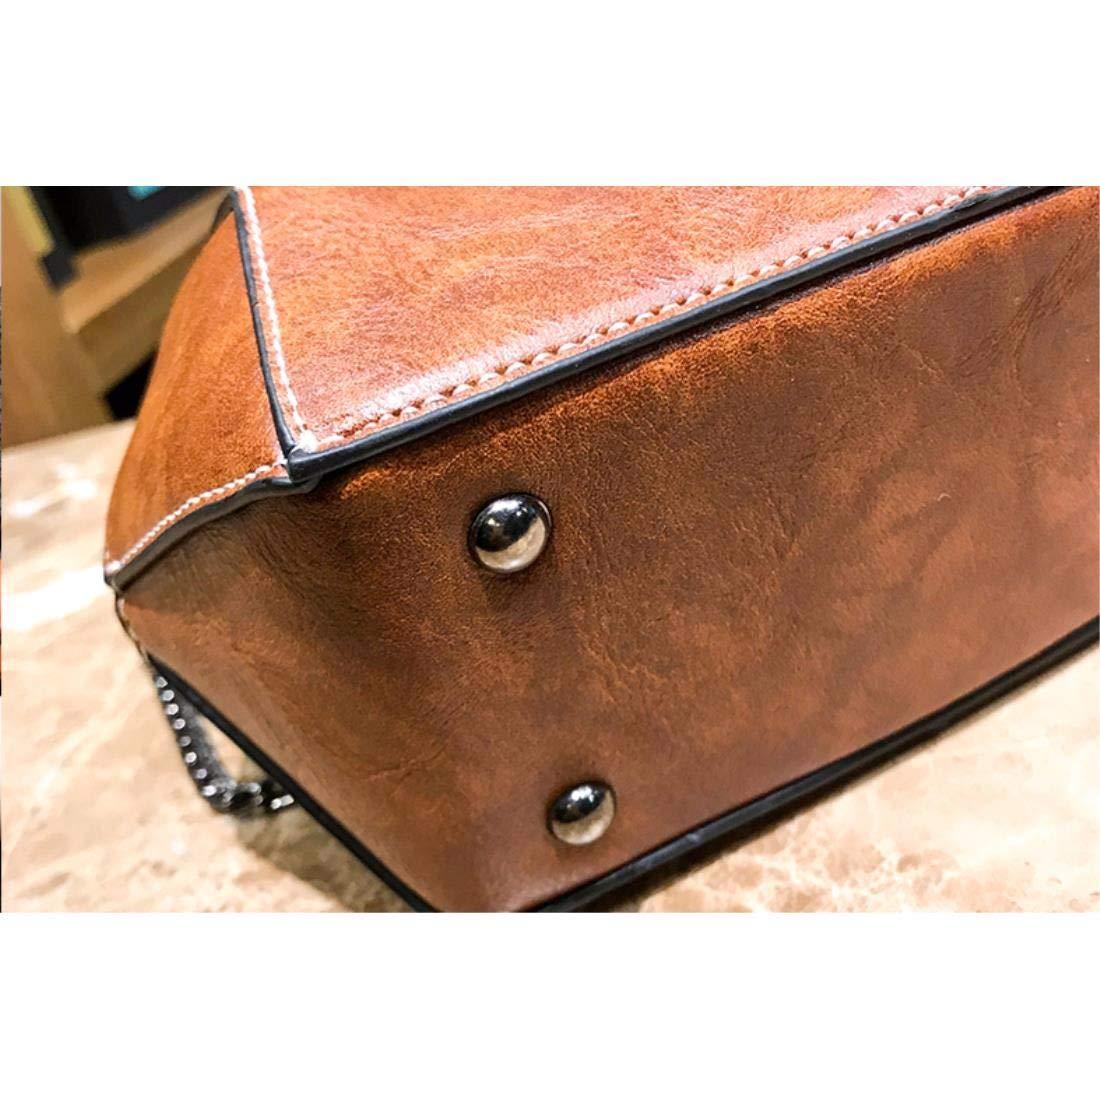 LIUXINDA-BB Damen Vintage Vintage Vintage Stil Soft Echtes Leder Elegant Schultertasche B07GPX6944 Umhngetaschen Wunderbar 6c12d1